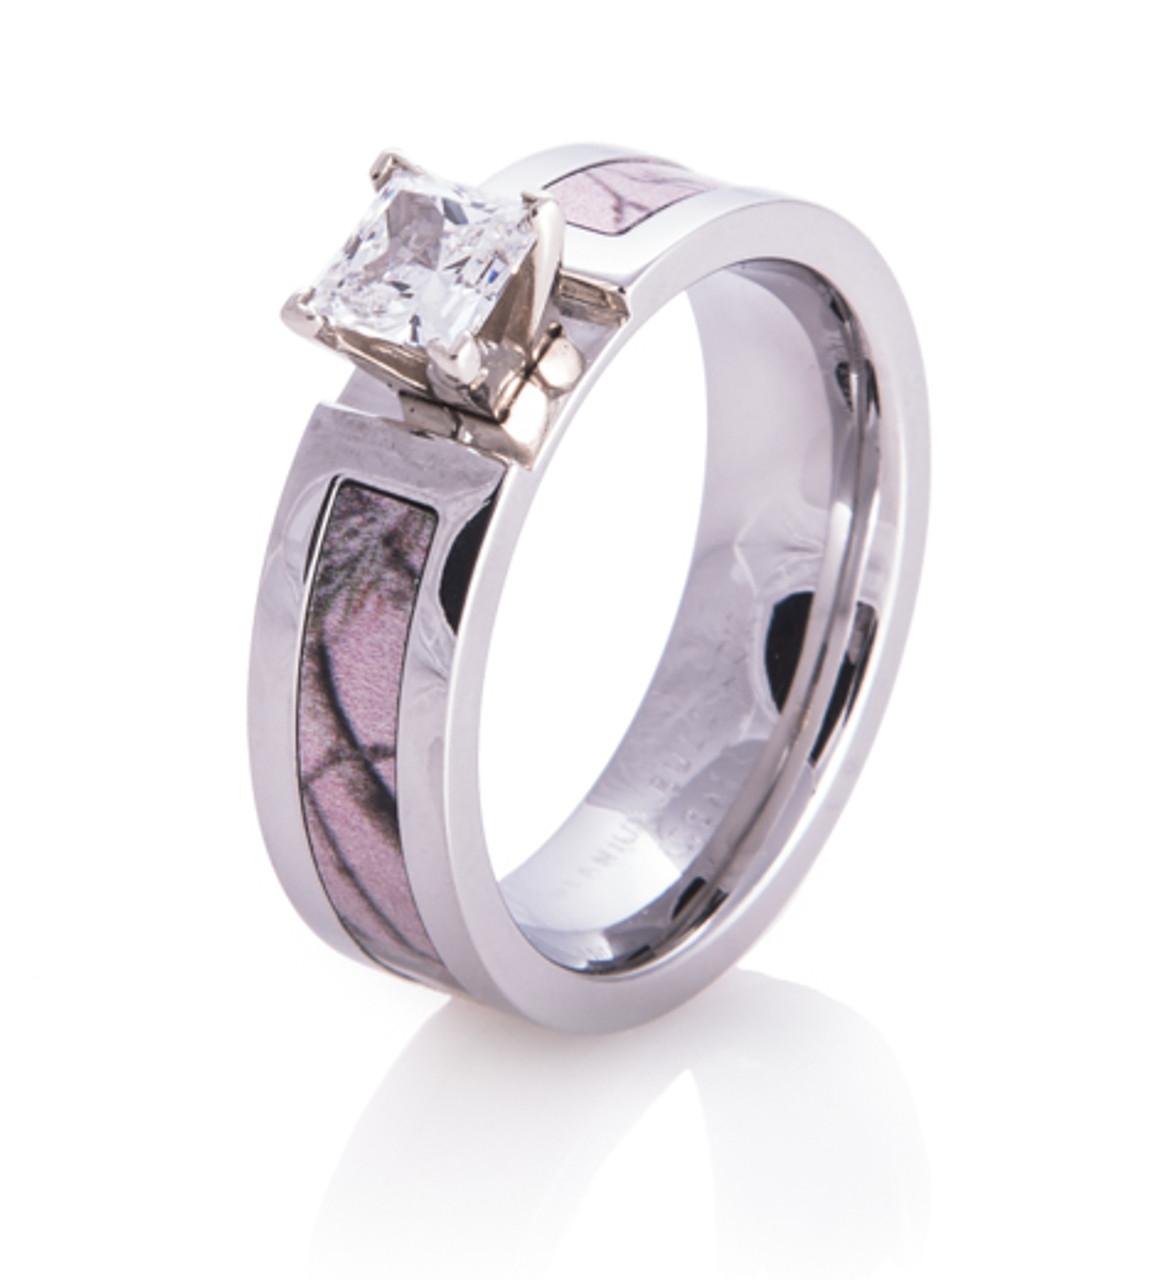 Women S Cobalt Chrome Realtree Ap Pink Camo Engagement Ring